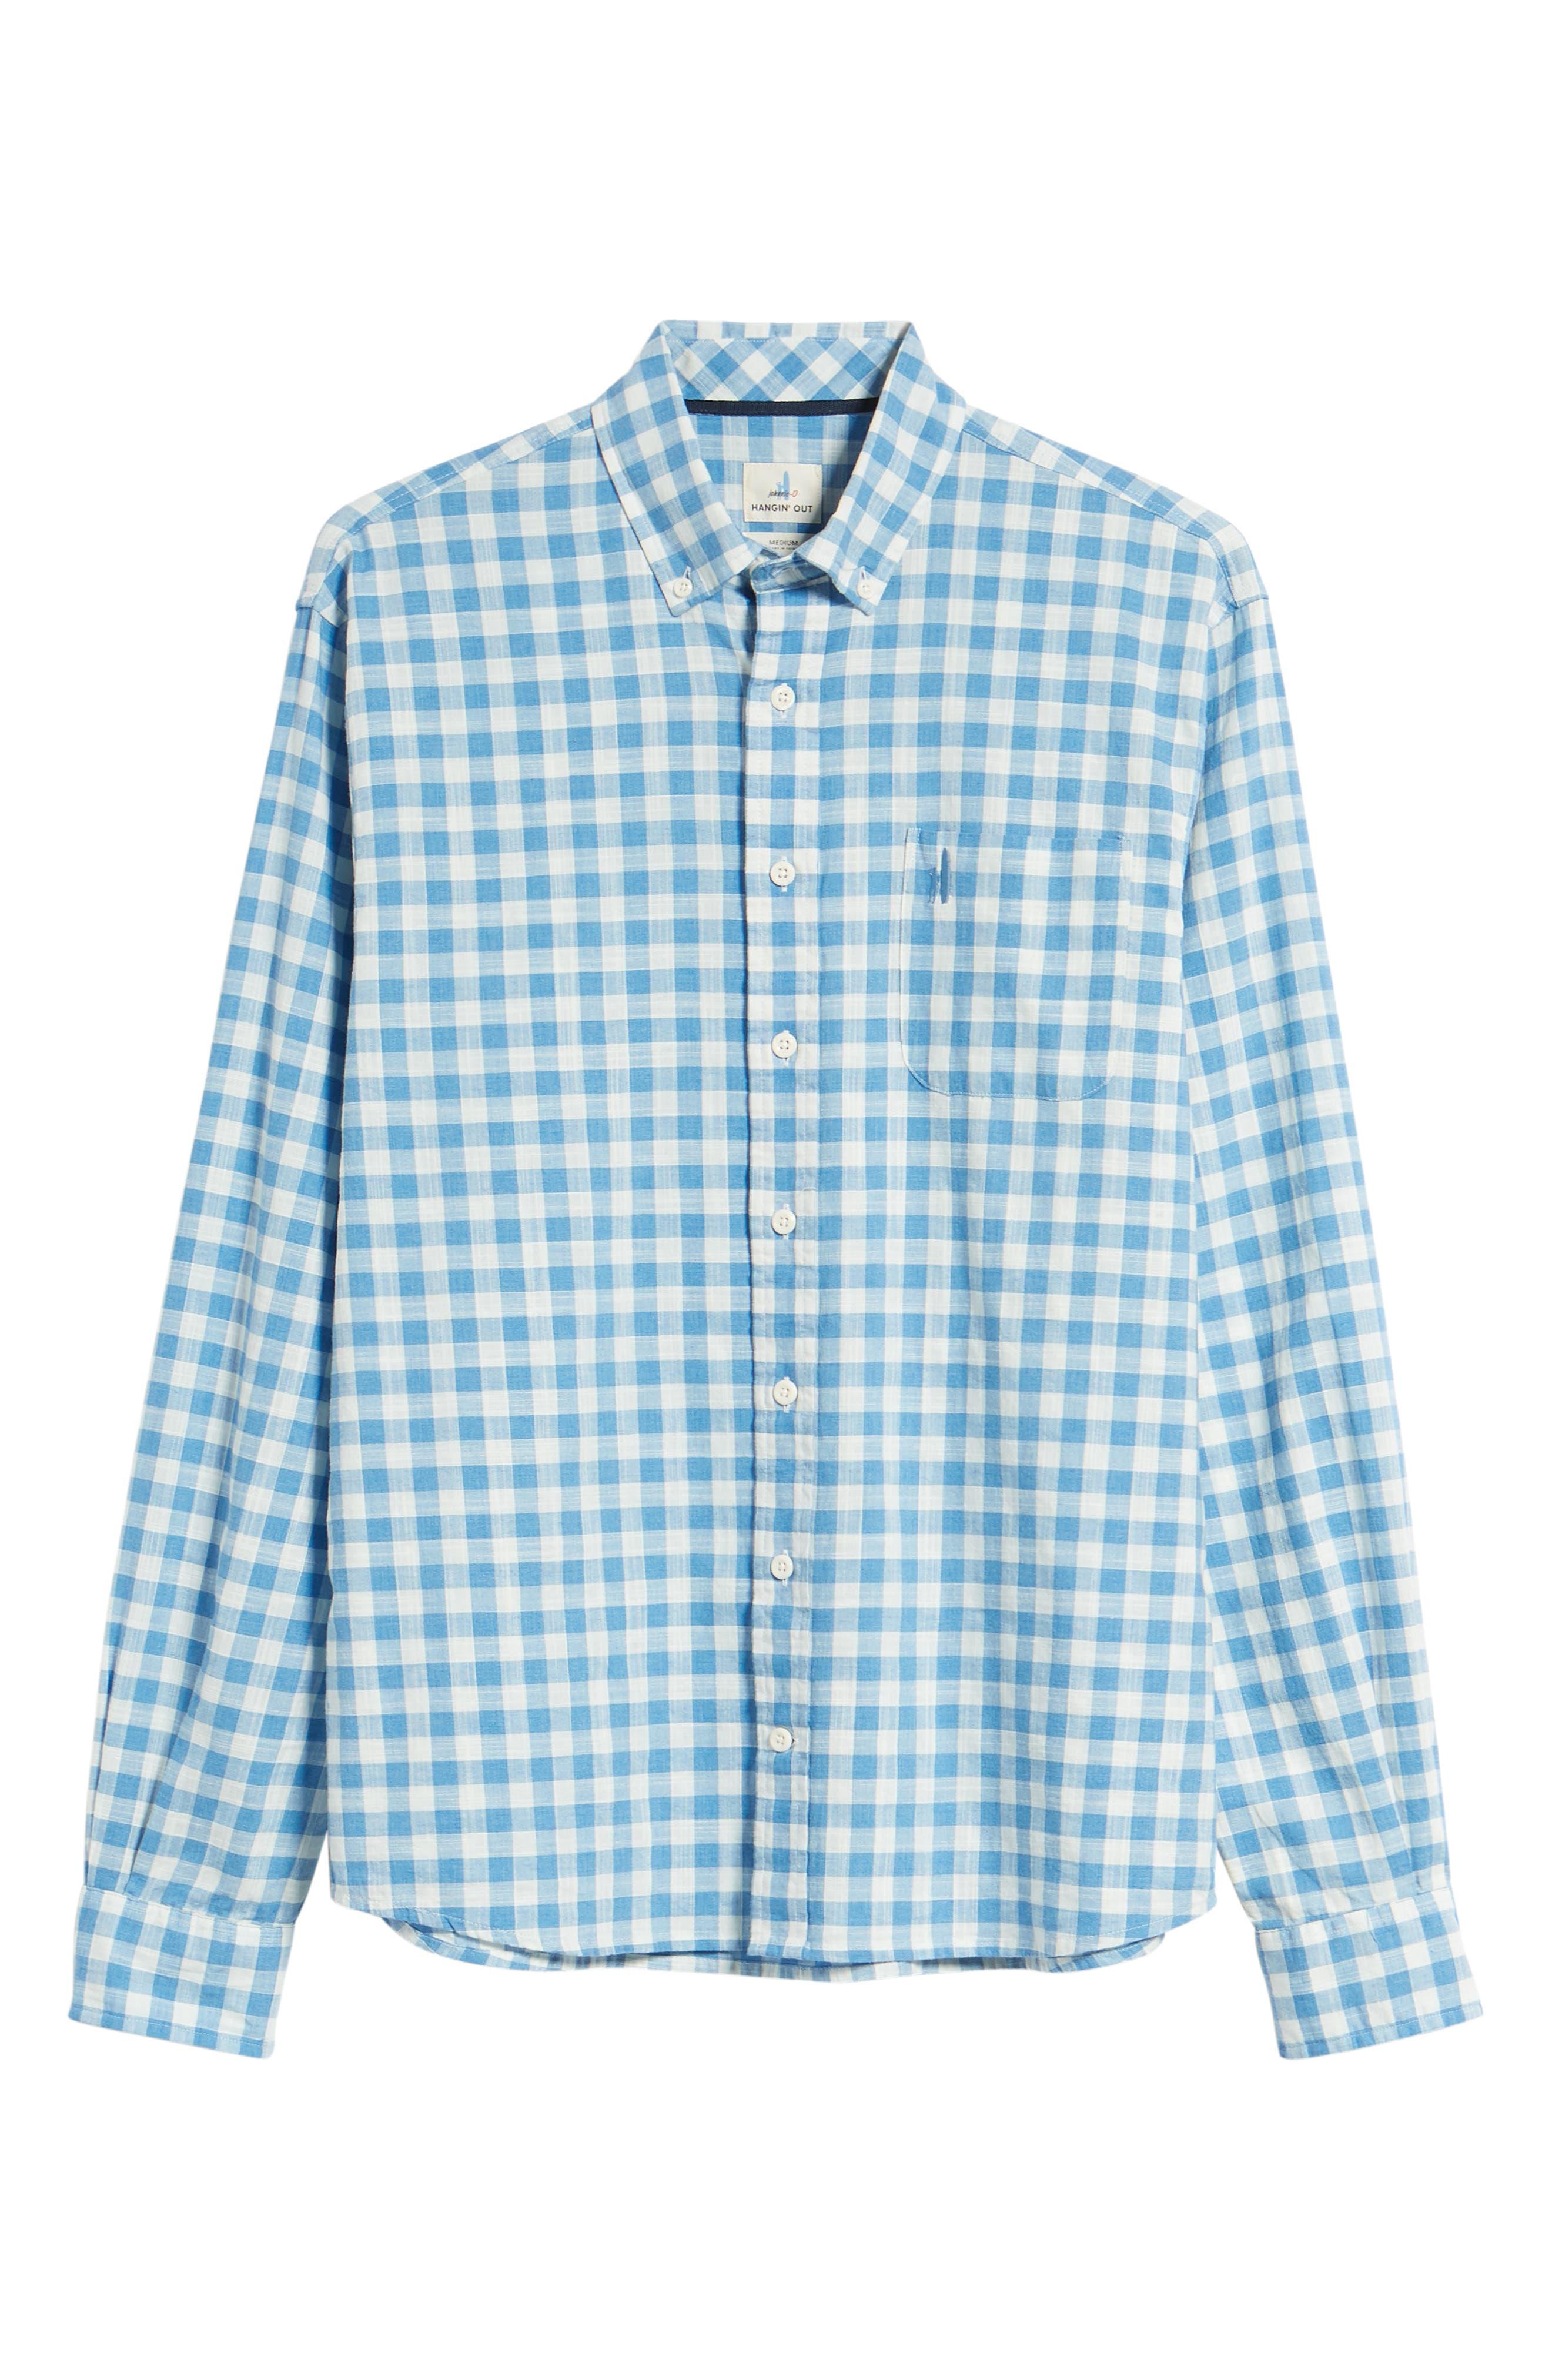 Watts Regular Fit Sport Shirt,                             Alternate thumbnail 6, color,                             Regatta